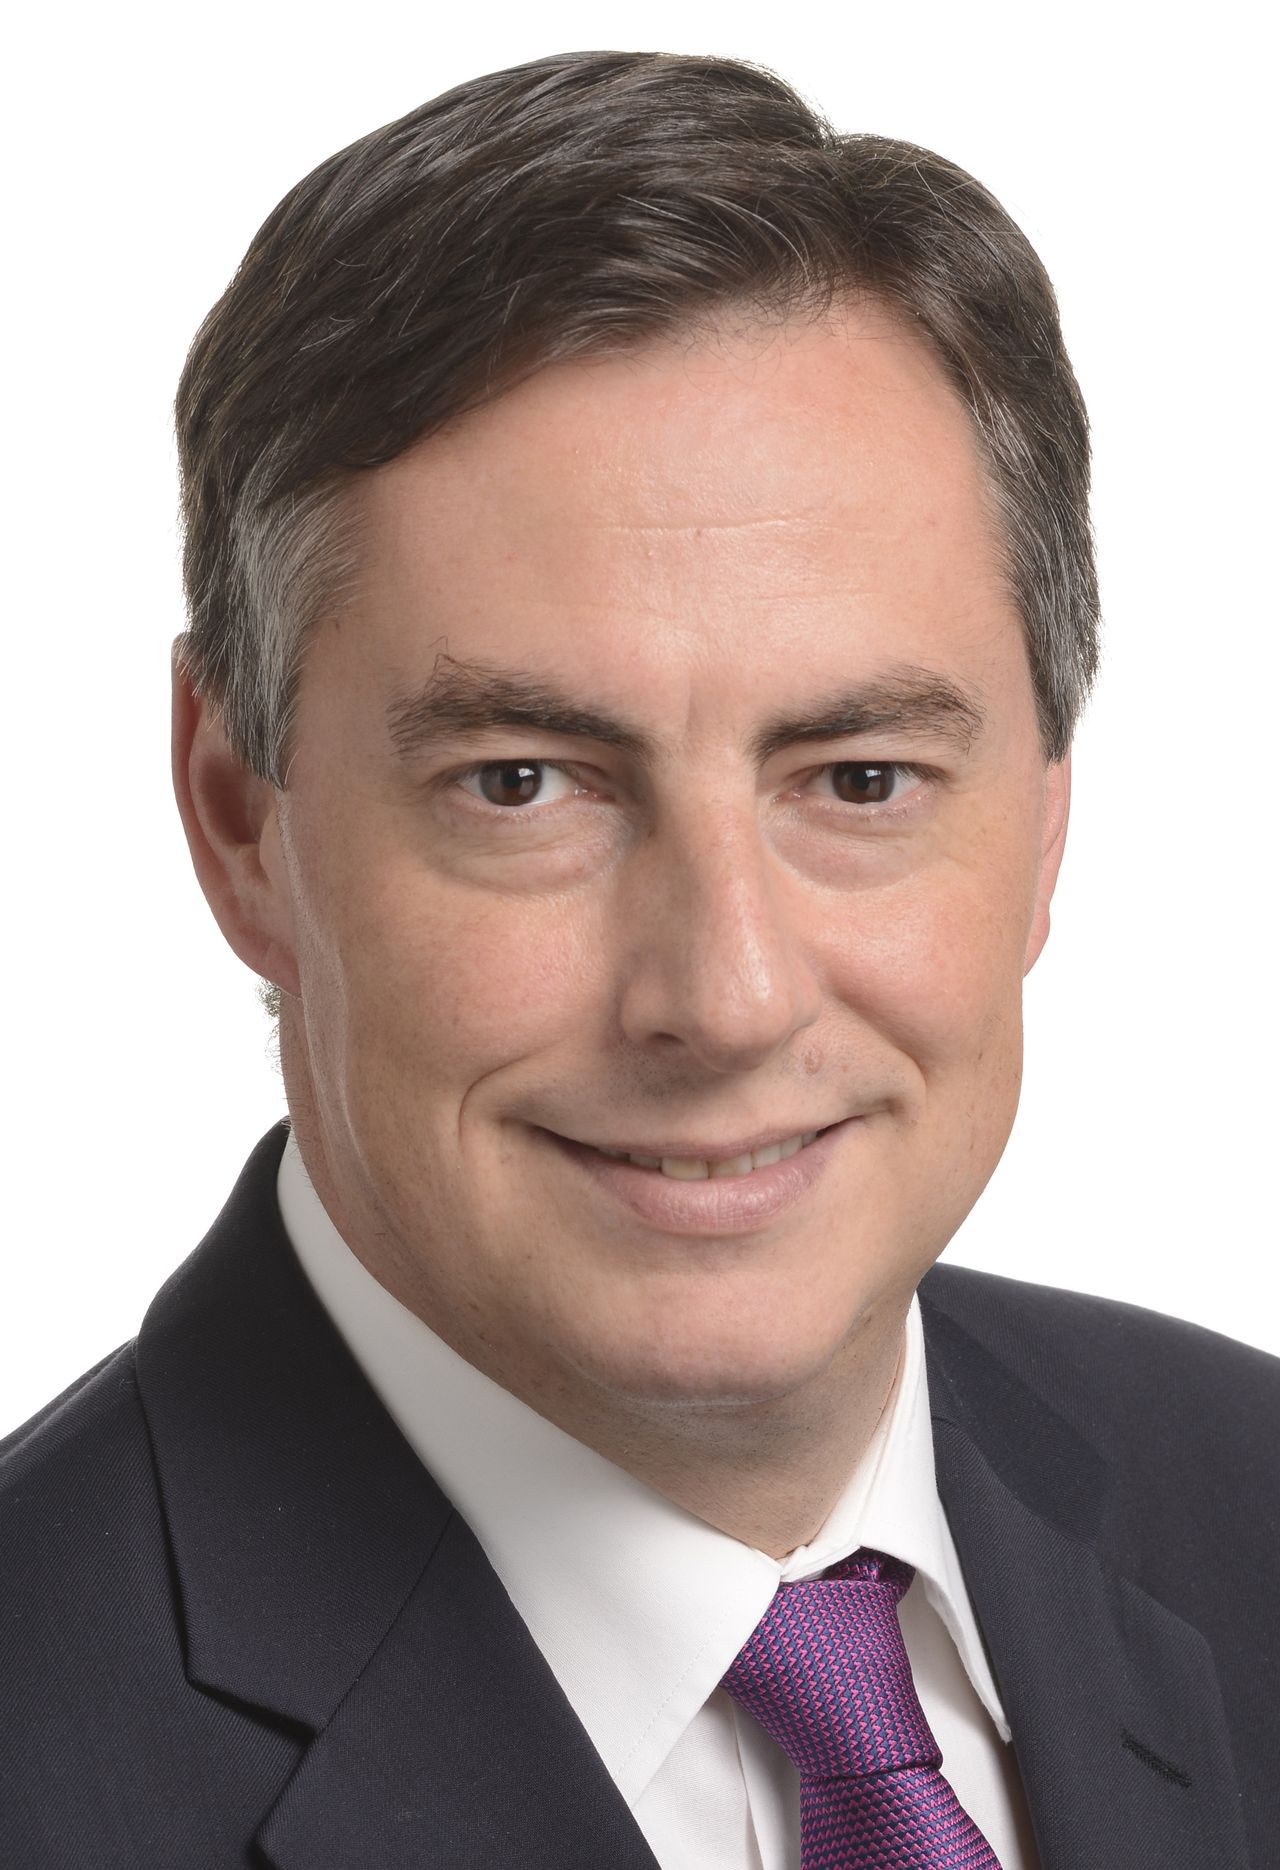 David McAllister